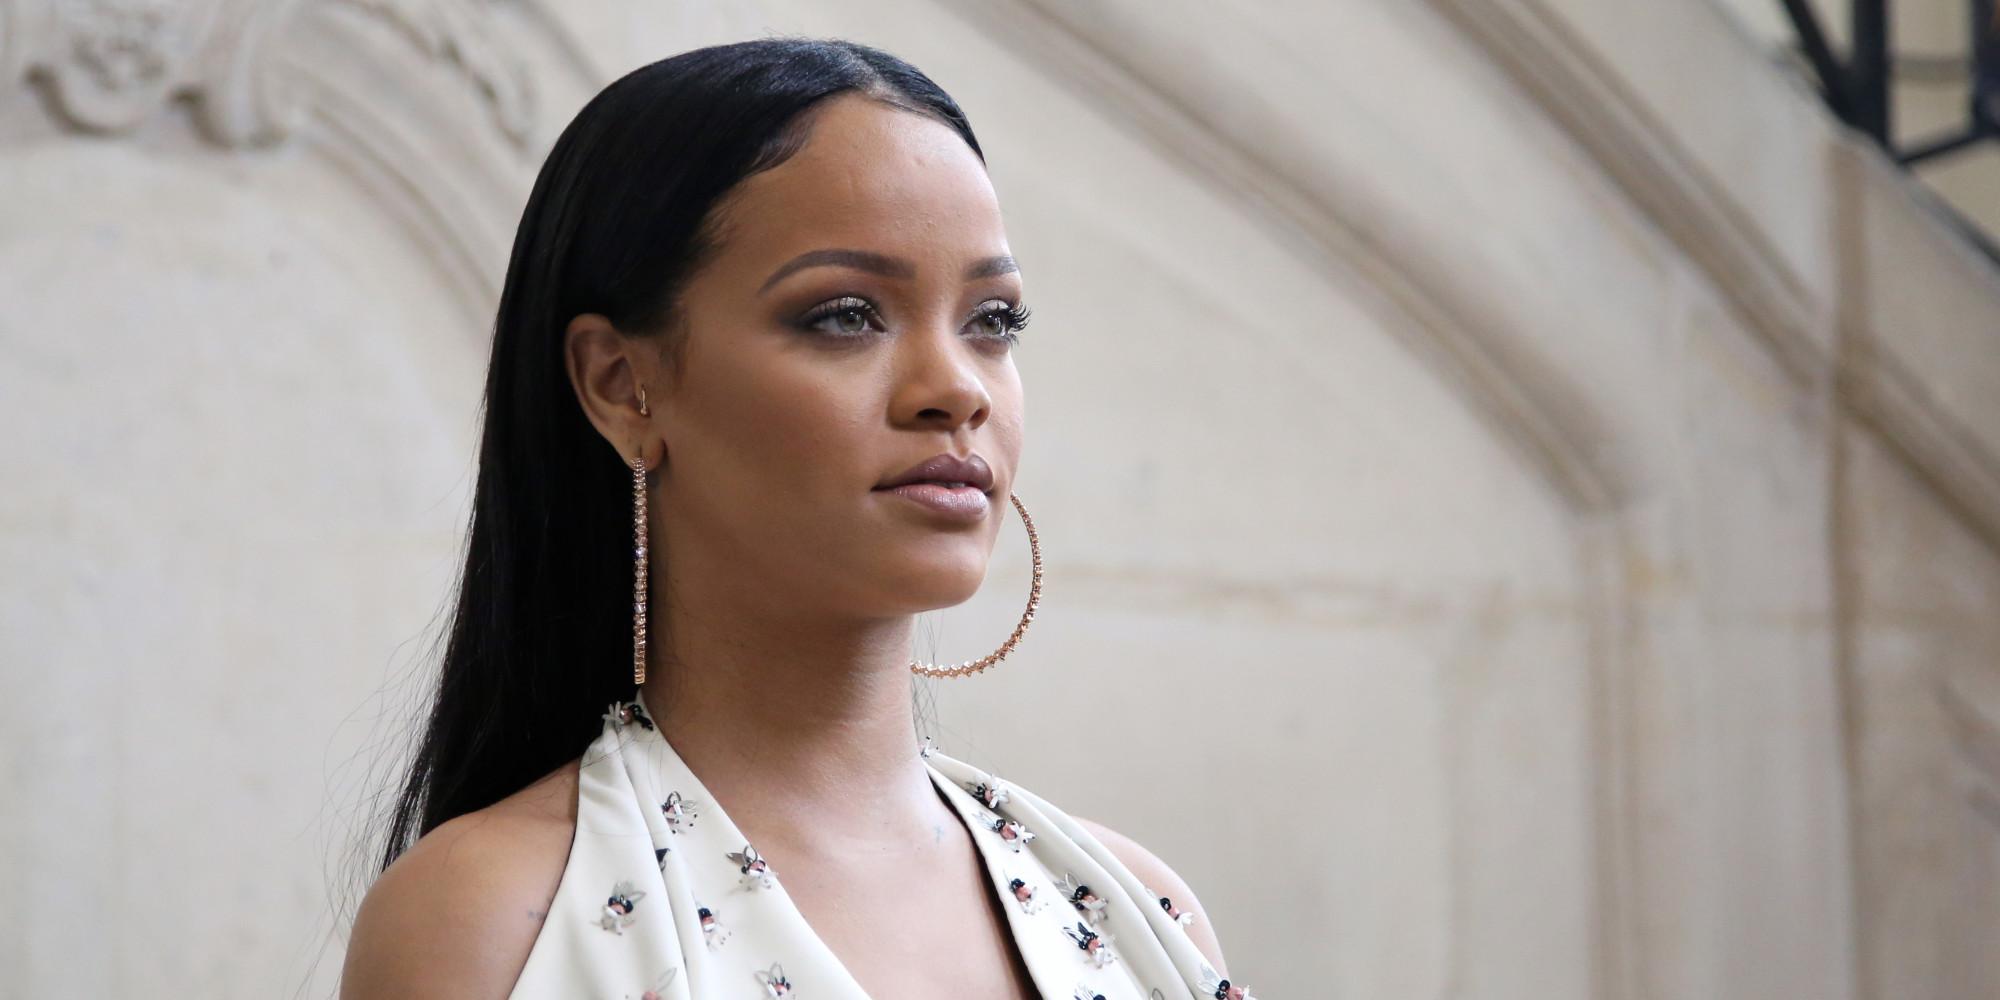 Rihanna a des dreadlocks - Rihanna poids 2017 ...